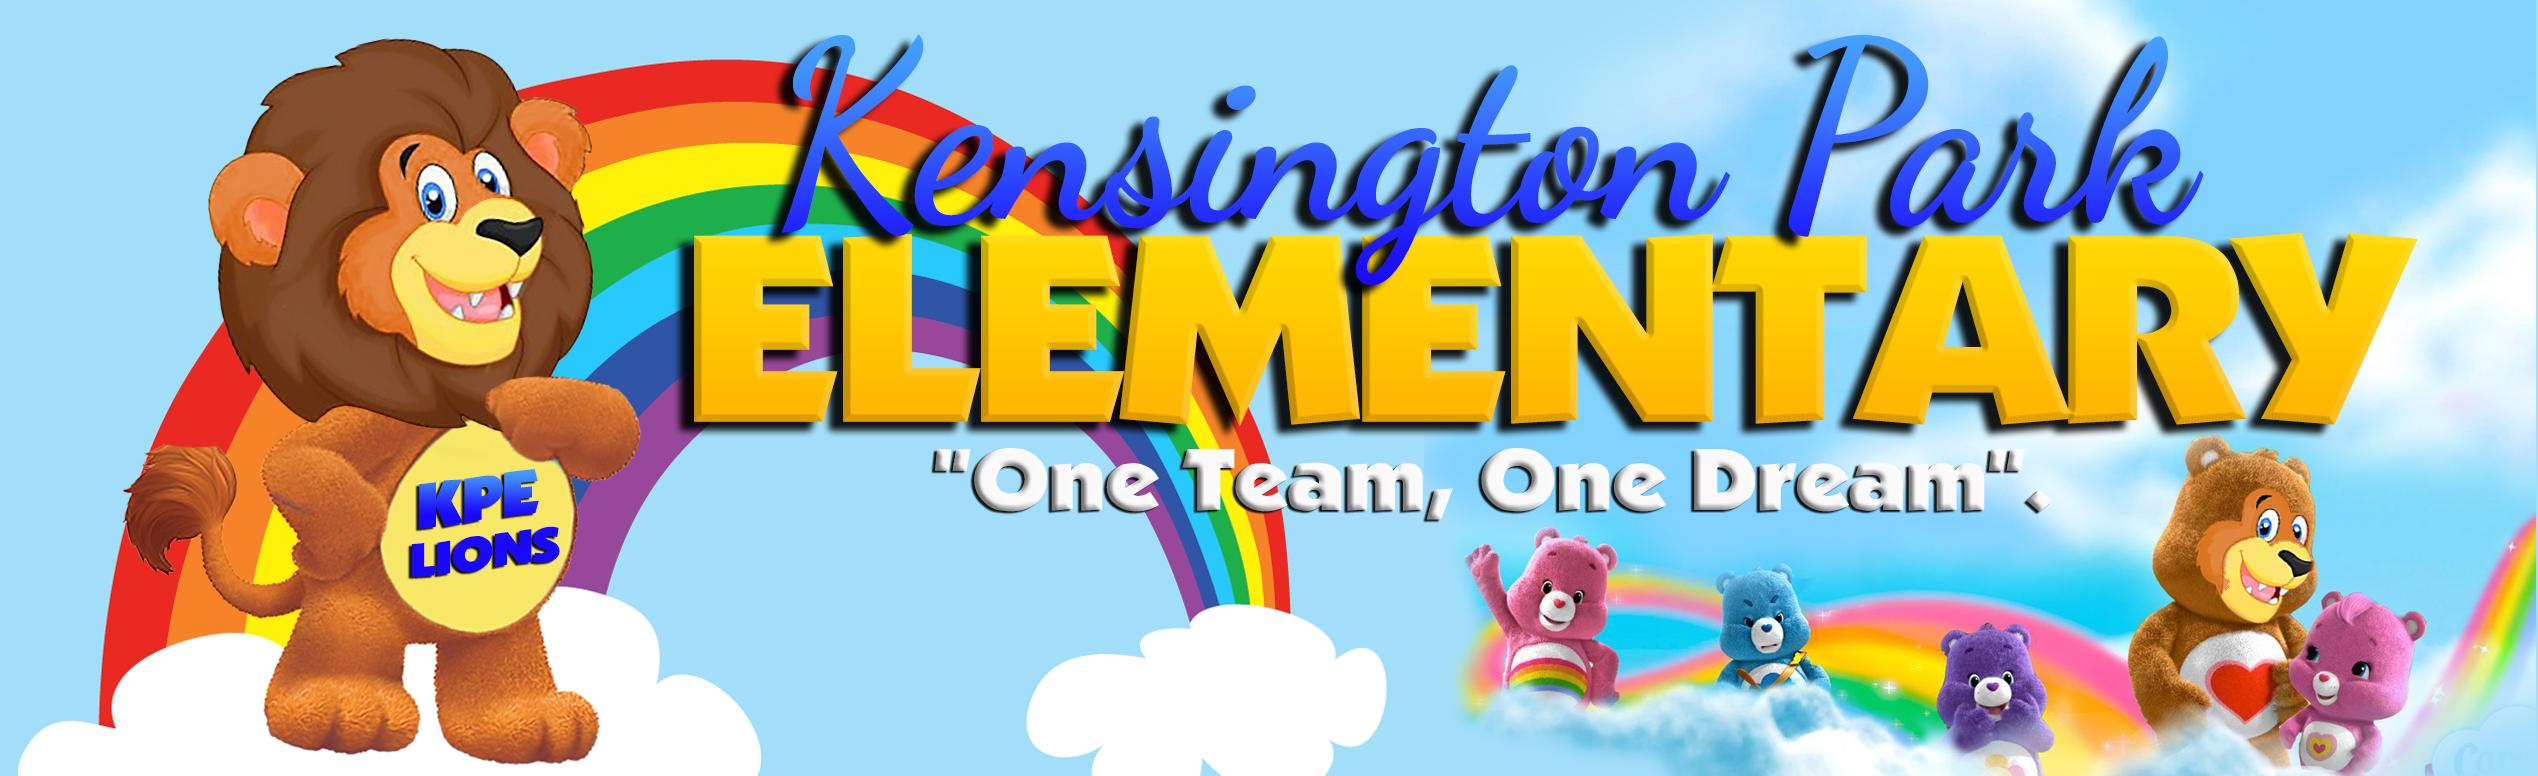 Kensington Park Elementary